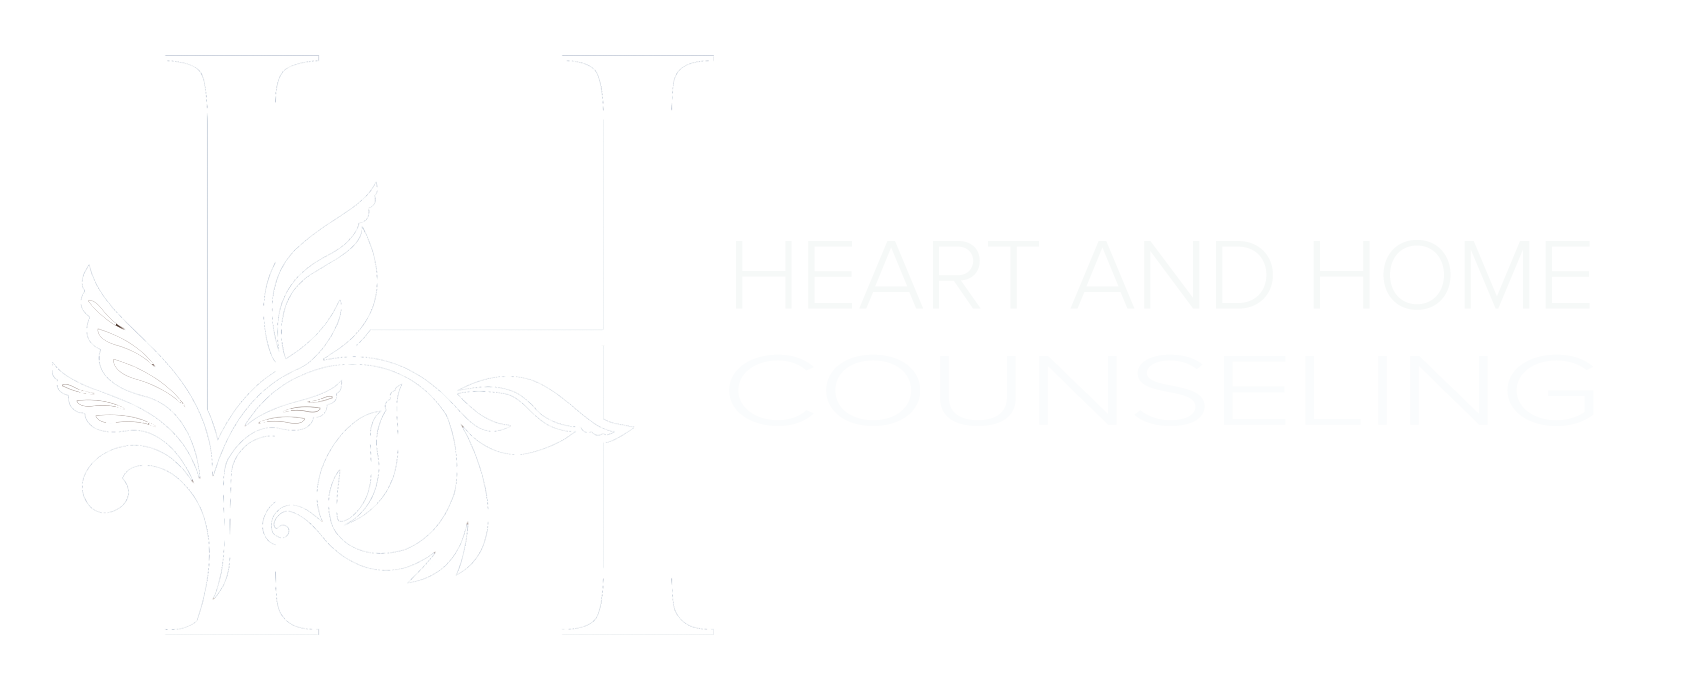 HeartandHomeCounseling.com